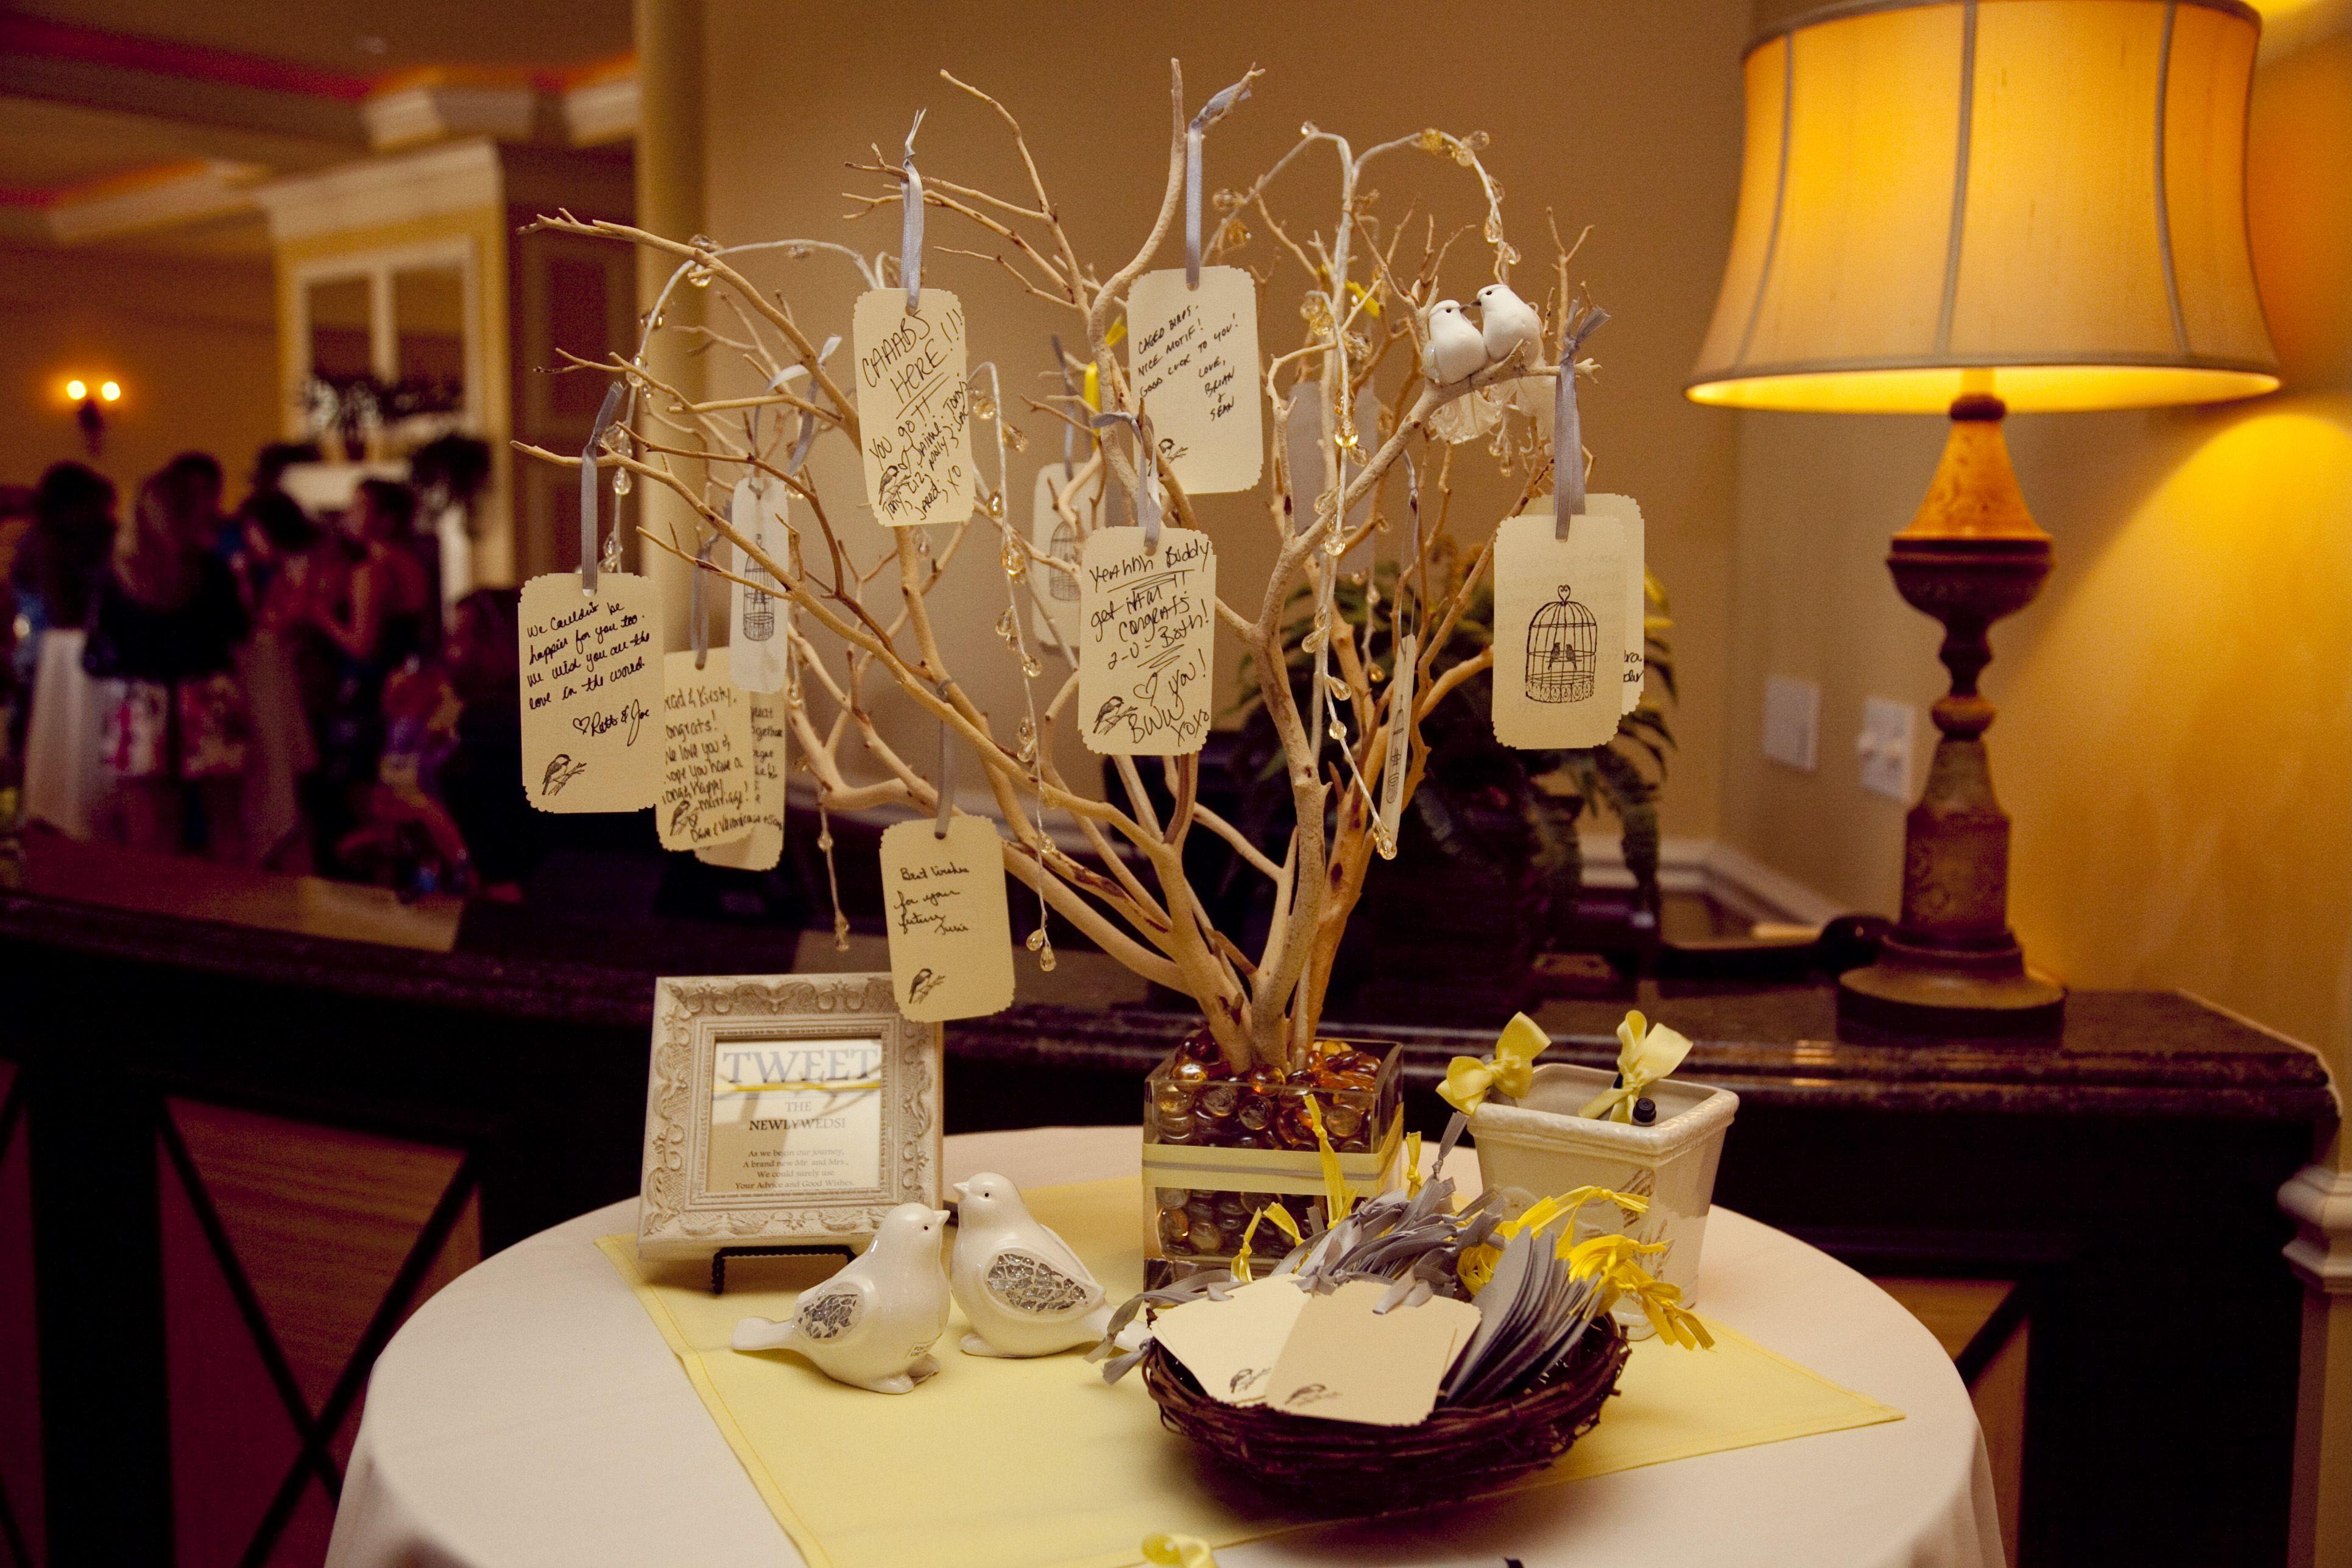 Our wedding wish tree - grey and yellow wedding